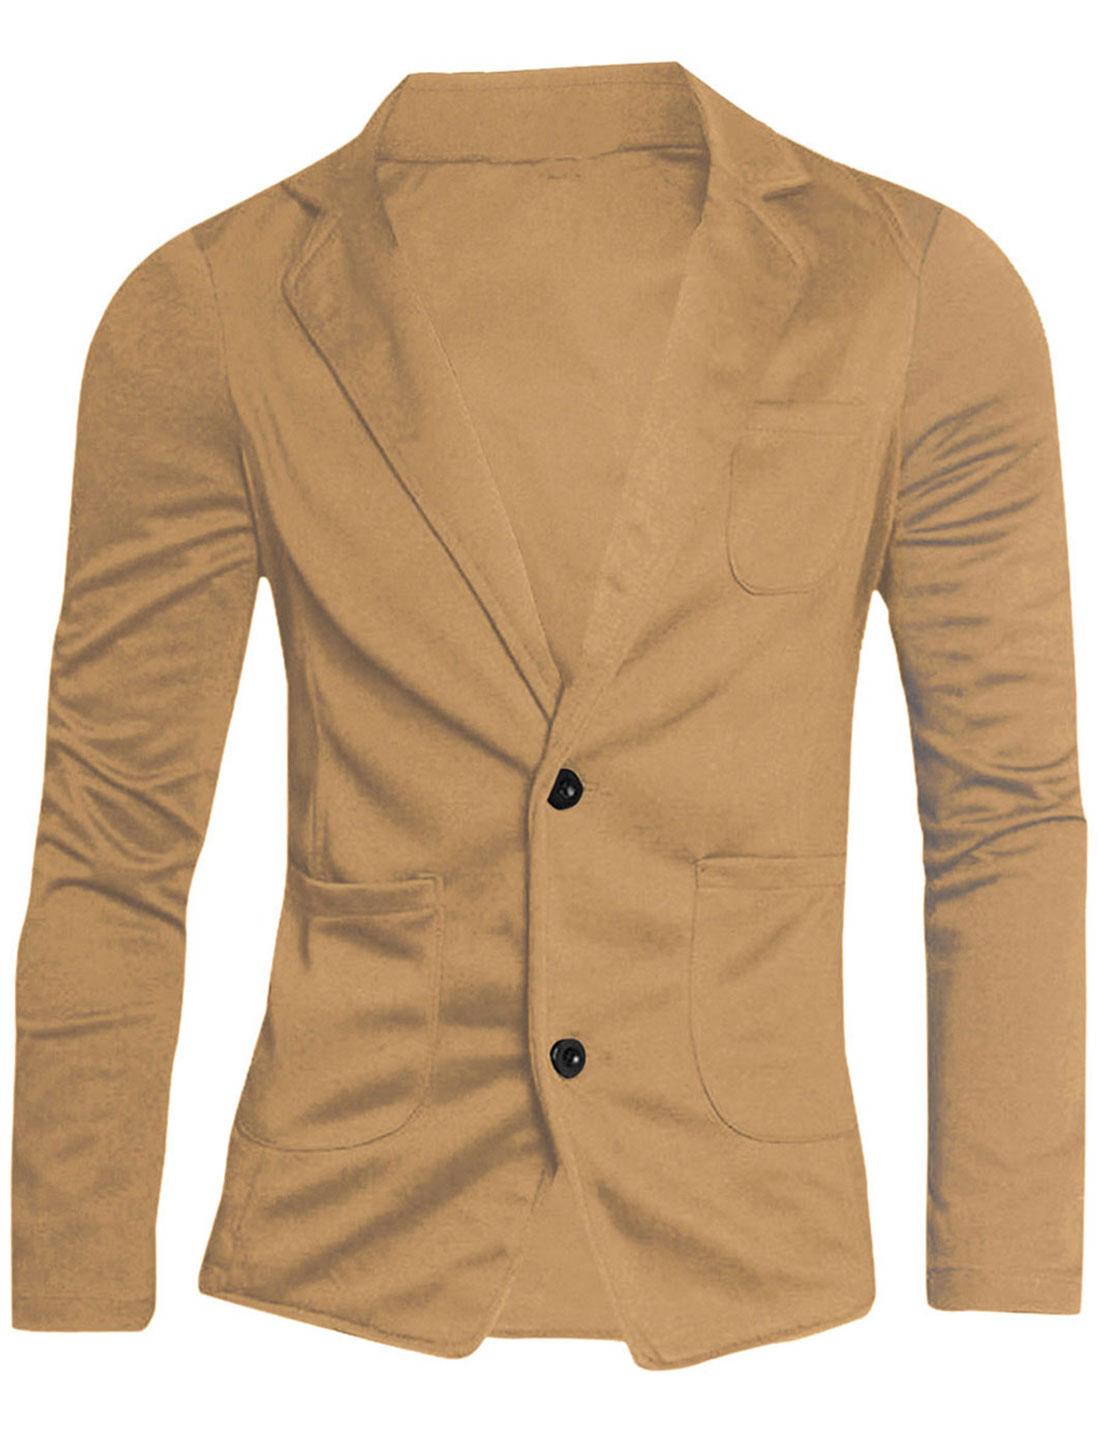 Men Notched Lapel Solid Color Long Sleeve Knit Blazer Beige 36